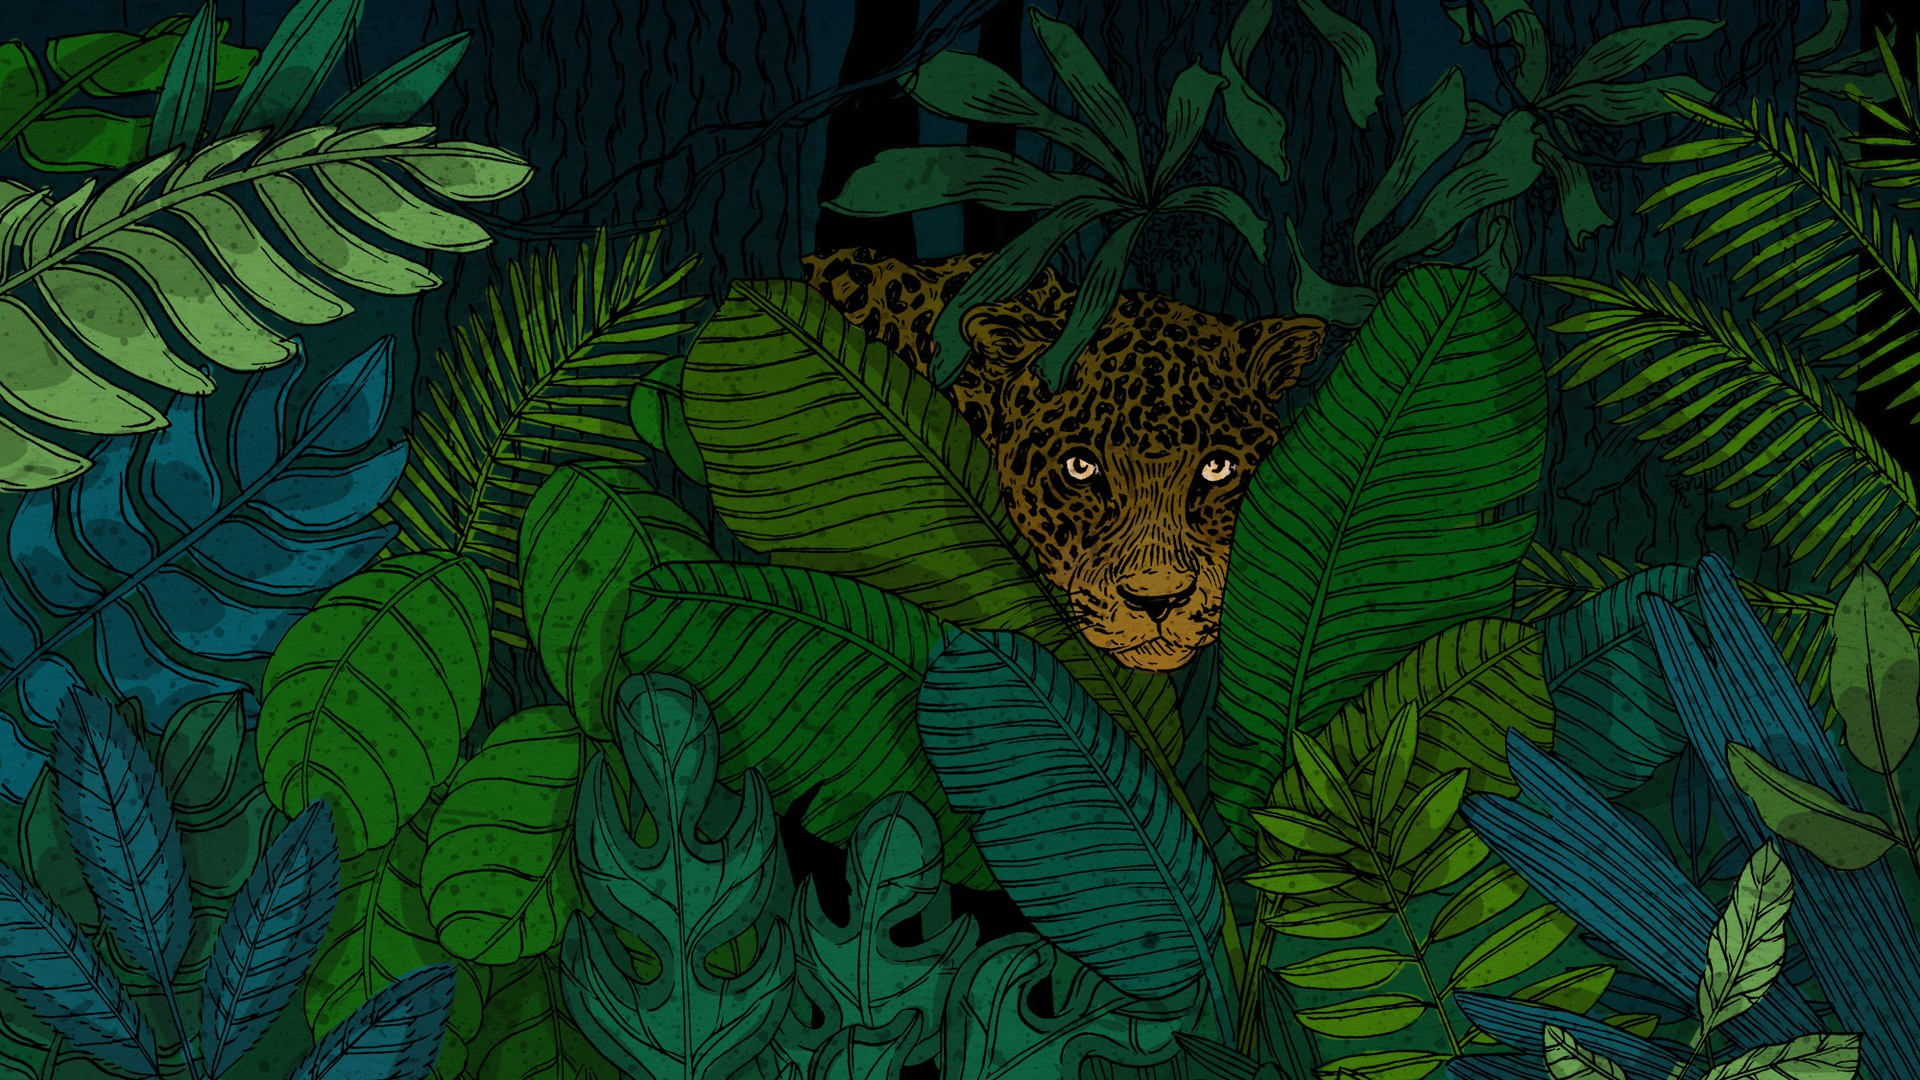 An illustration of a jaguar peeking through plants in a jungle